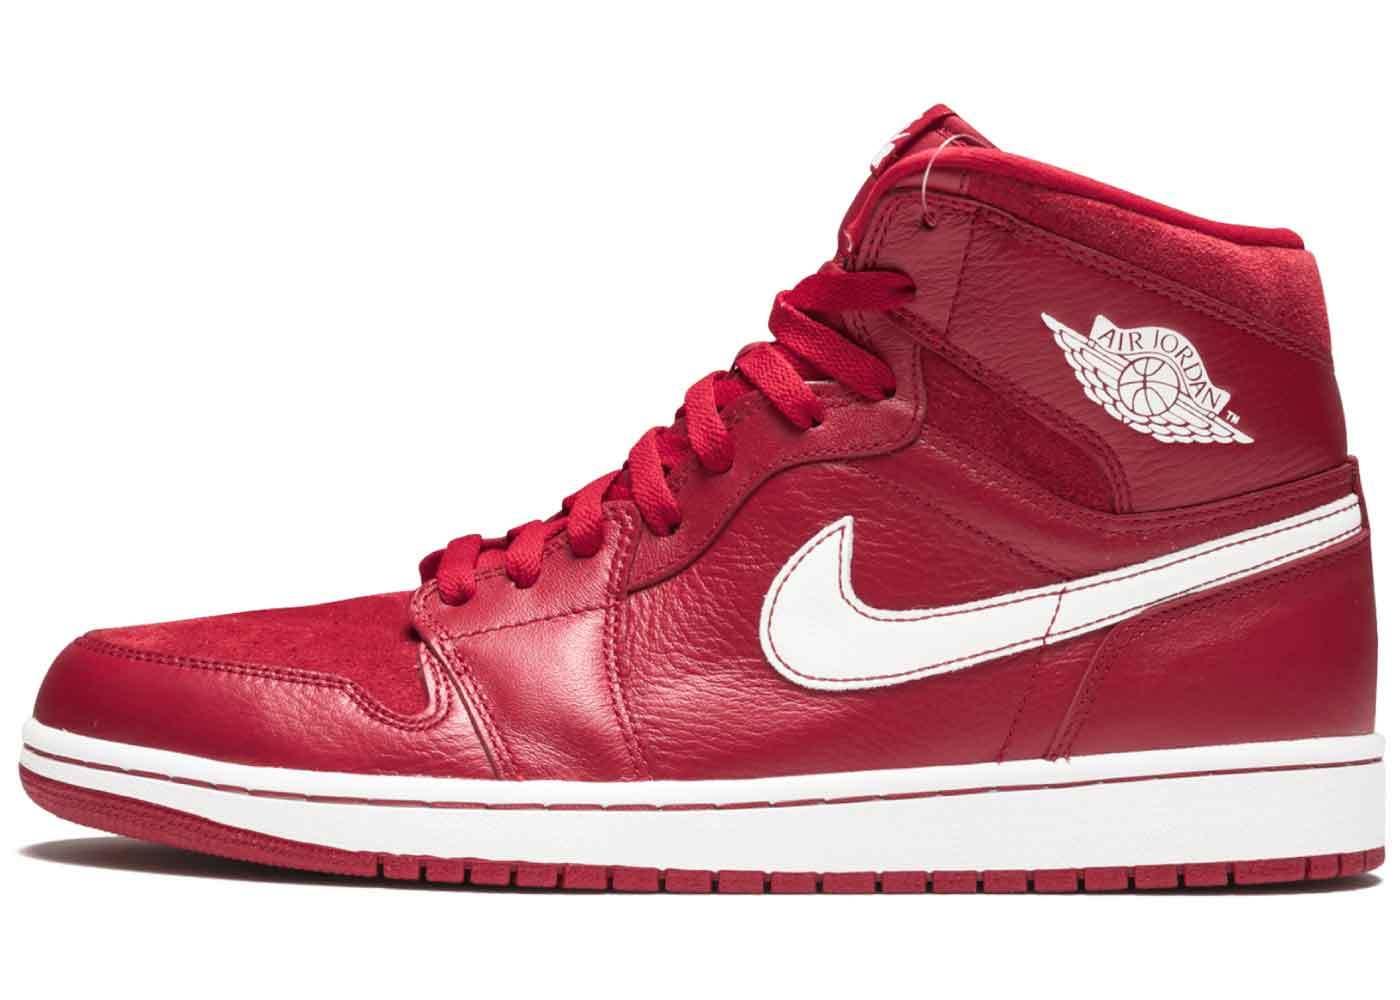 Nike Air Jordan 1 Retro Gym Redの写真